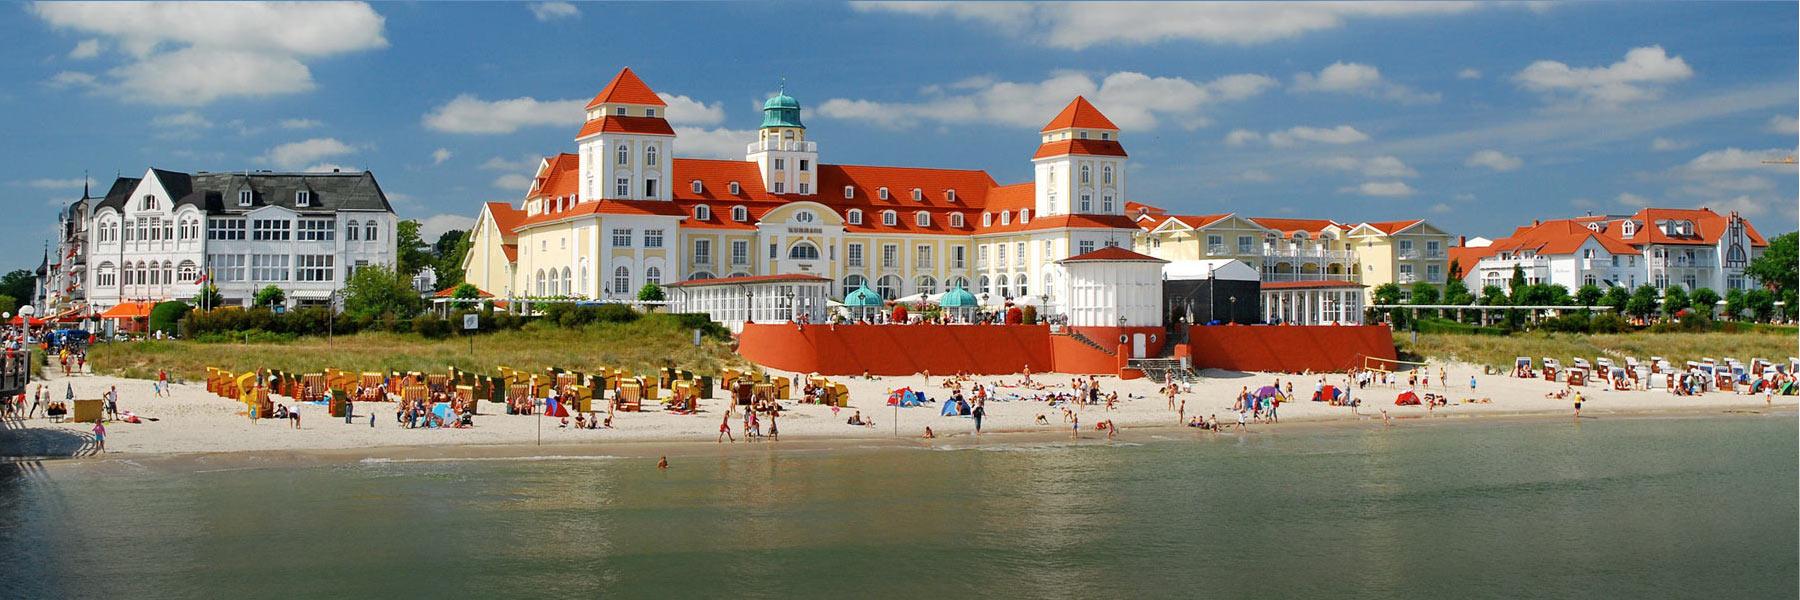 Ostseebad Binz - Insel Rügen